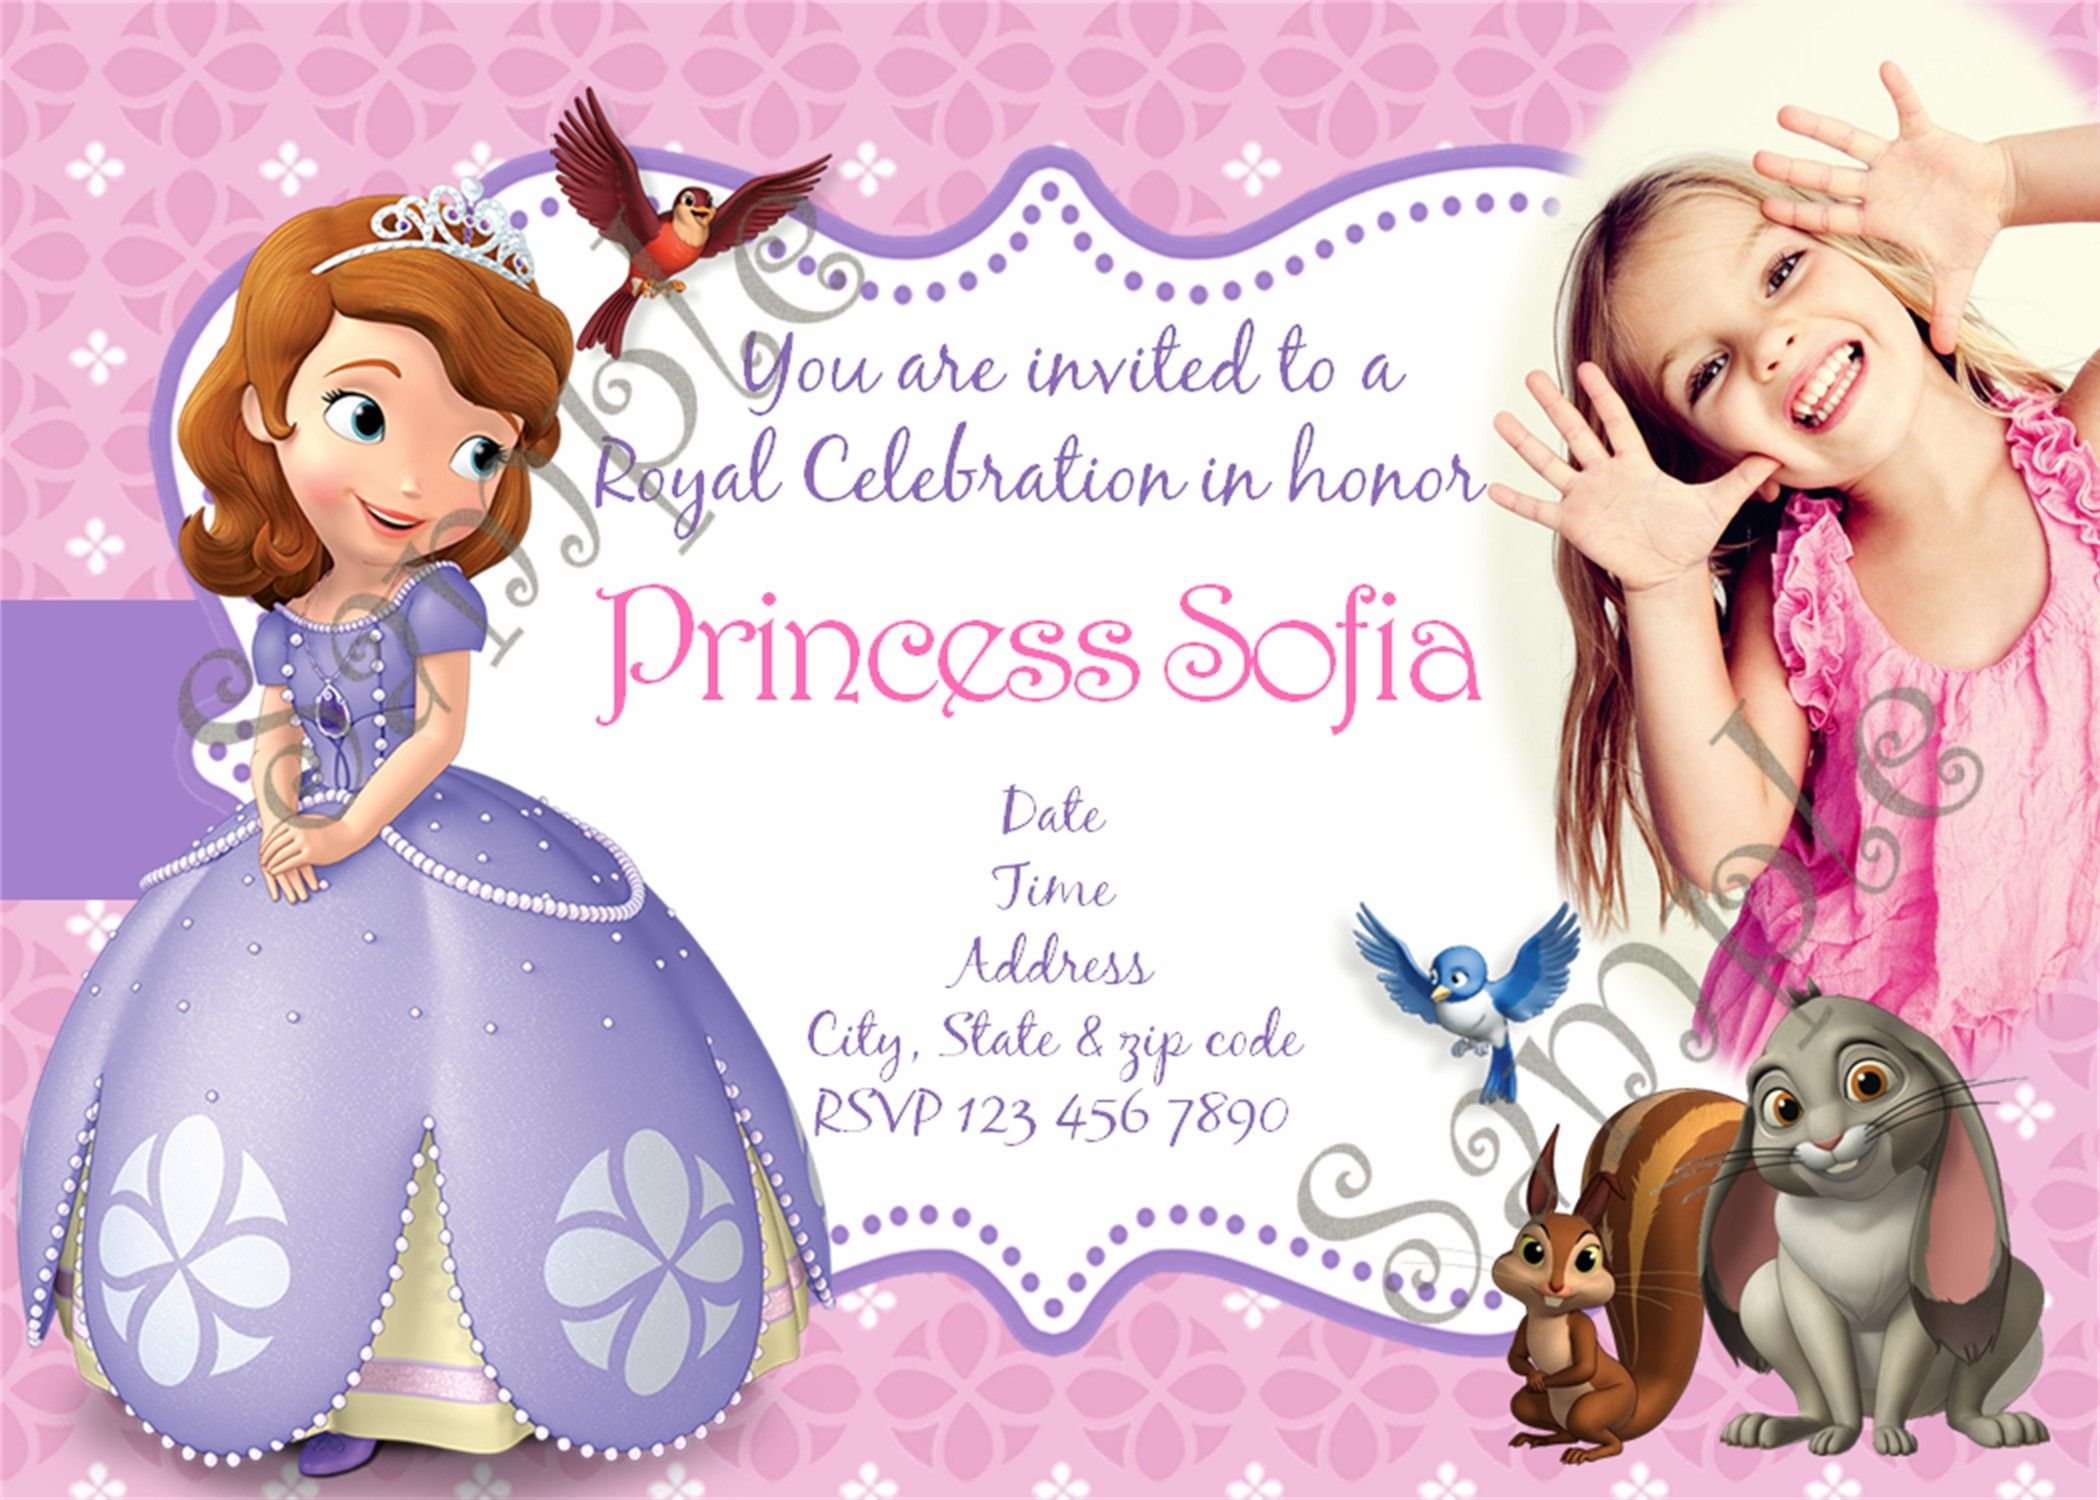 Sofia the first birthday party invitation | Sofia the first Birthday ...